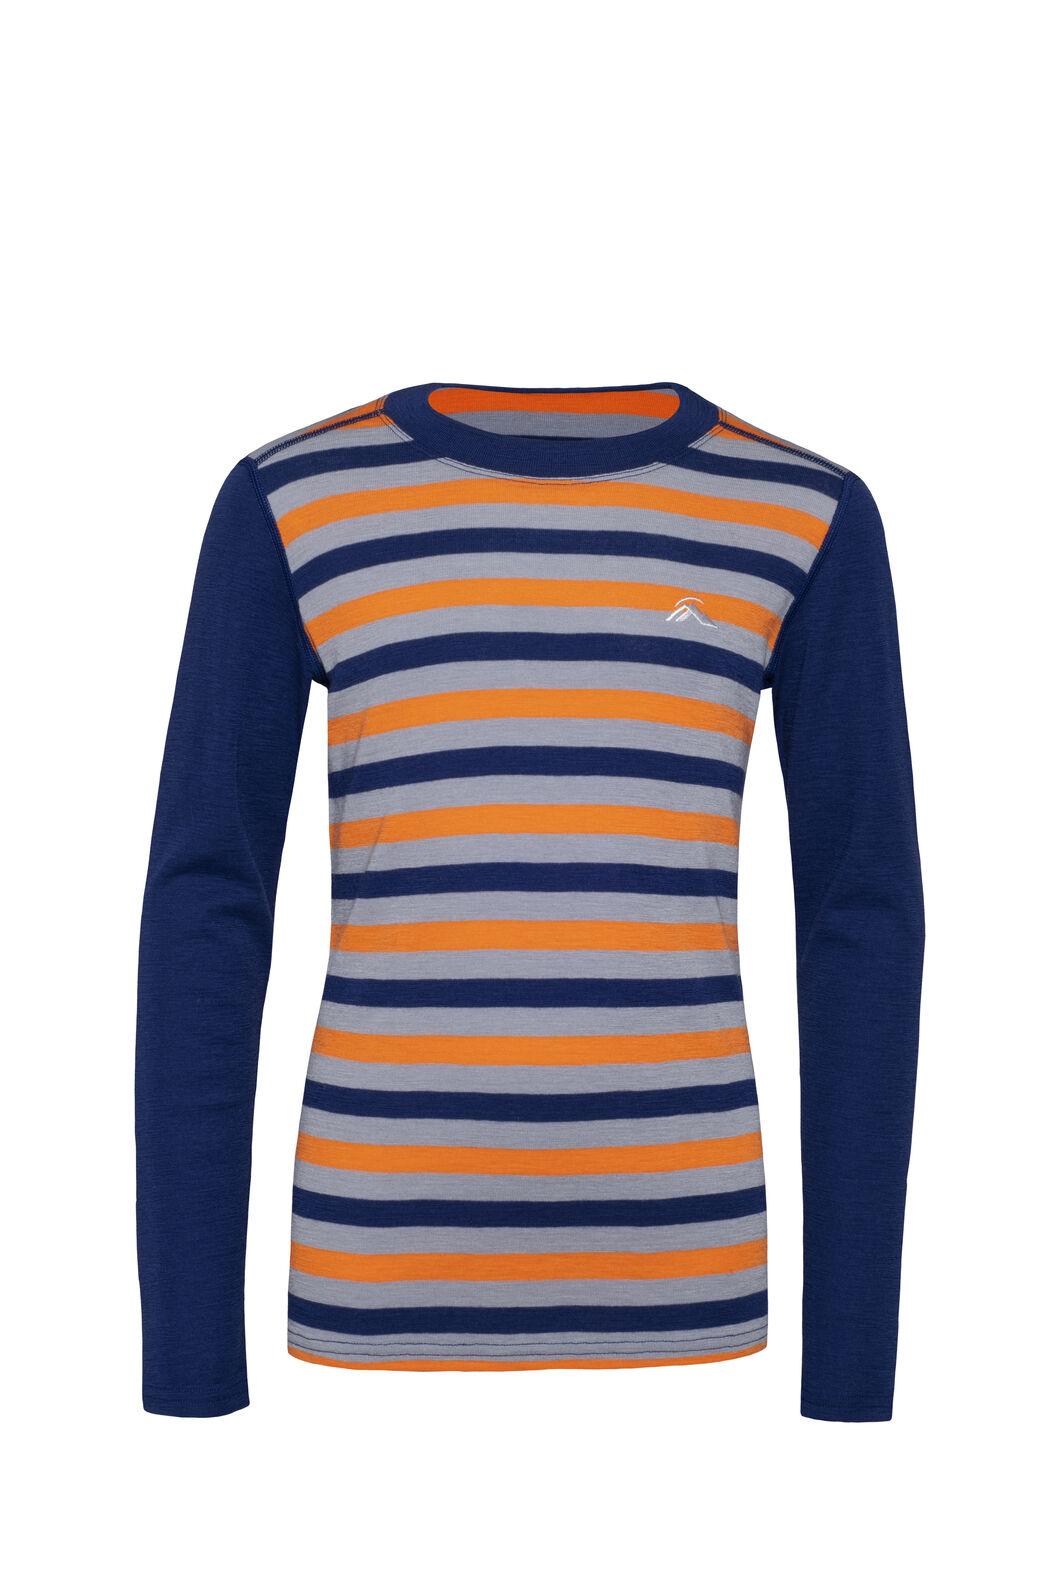 Macpac 220 Merino Long Sleeve Top — Kids', Blueprint Stripe, hi-res